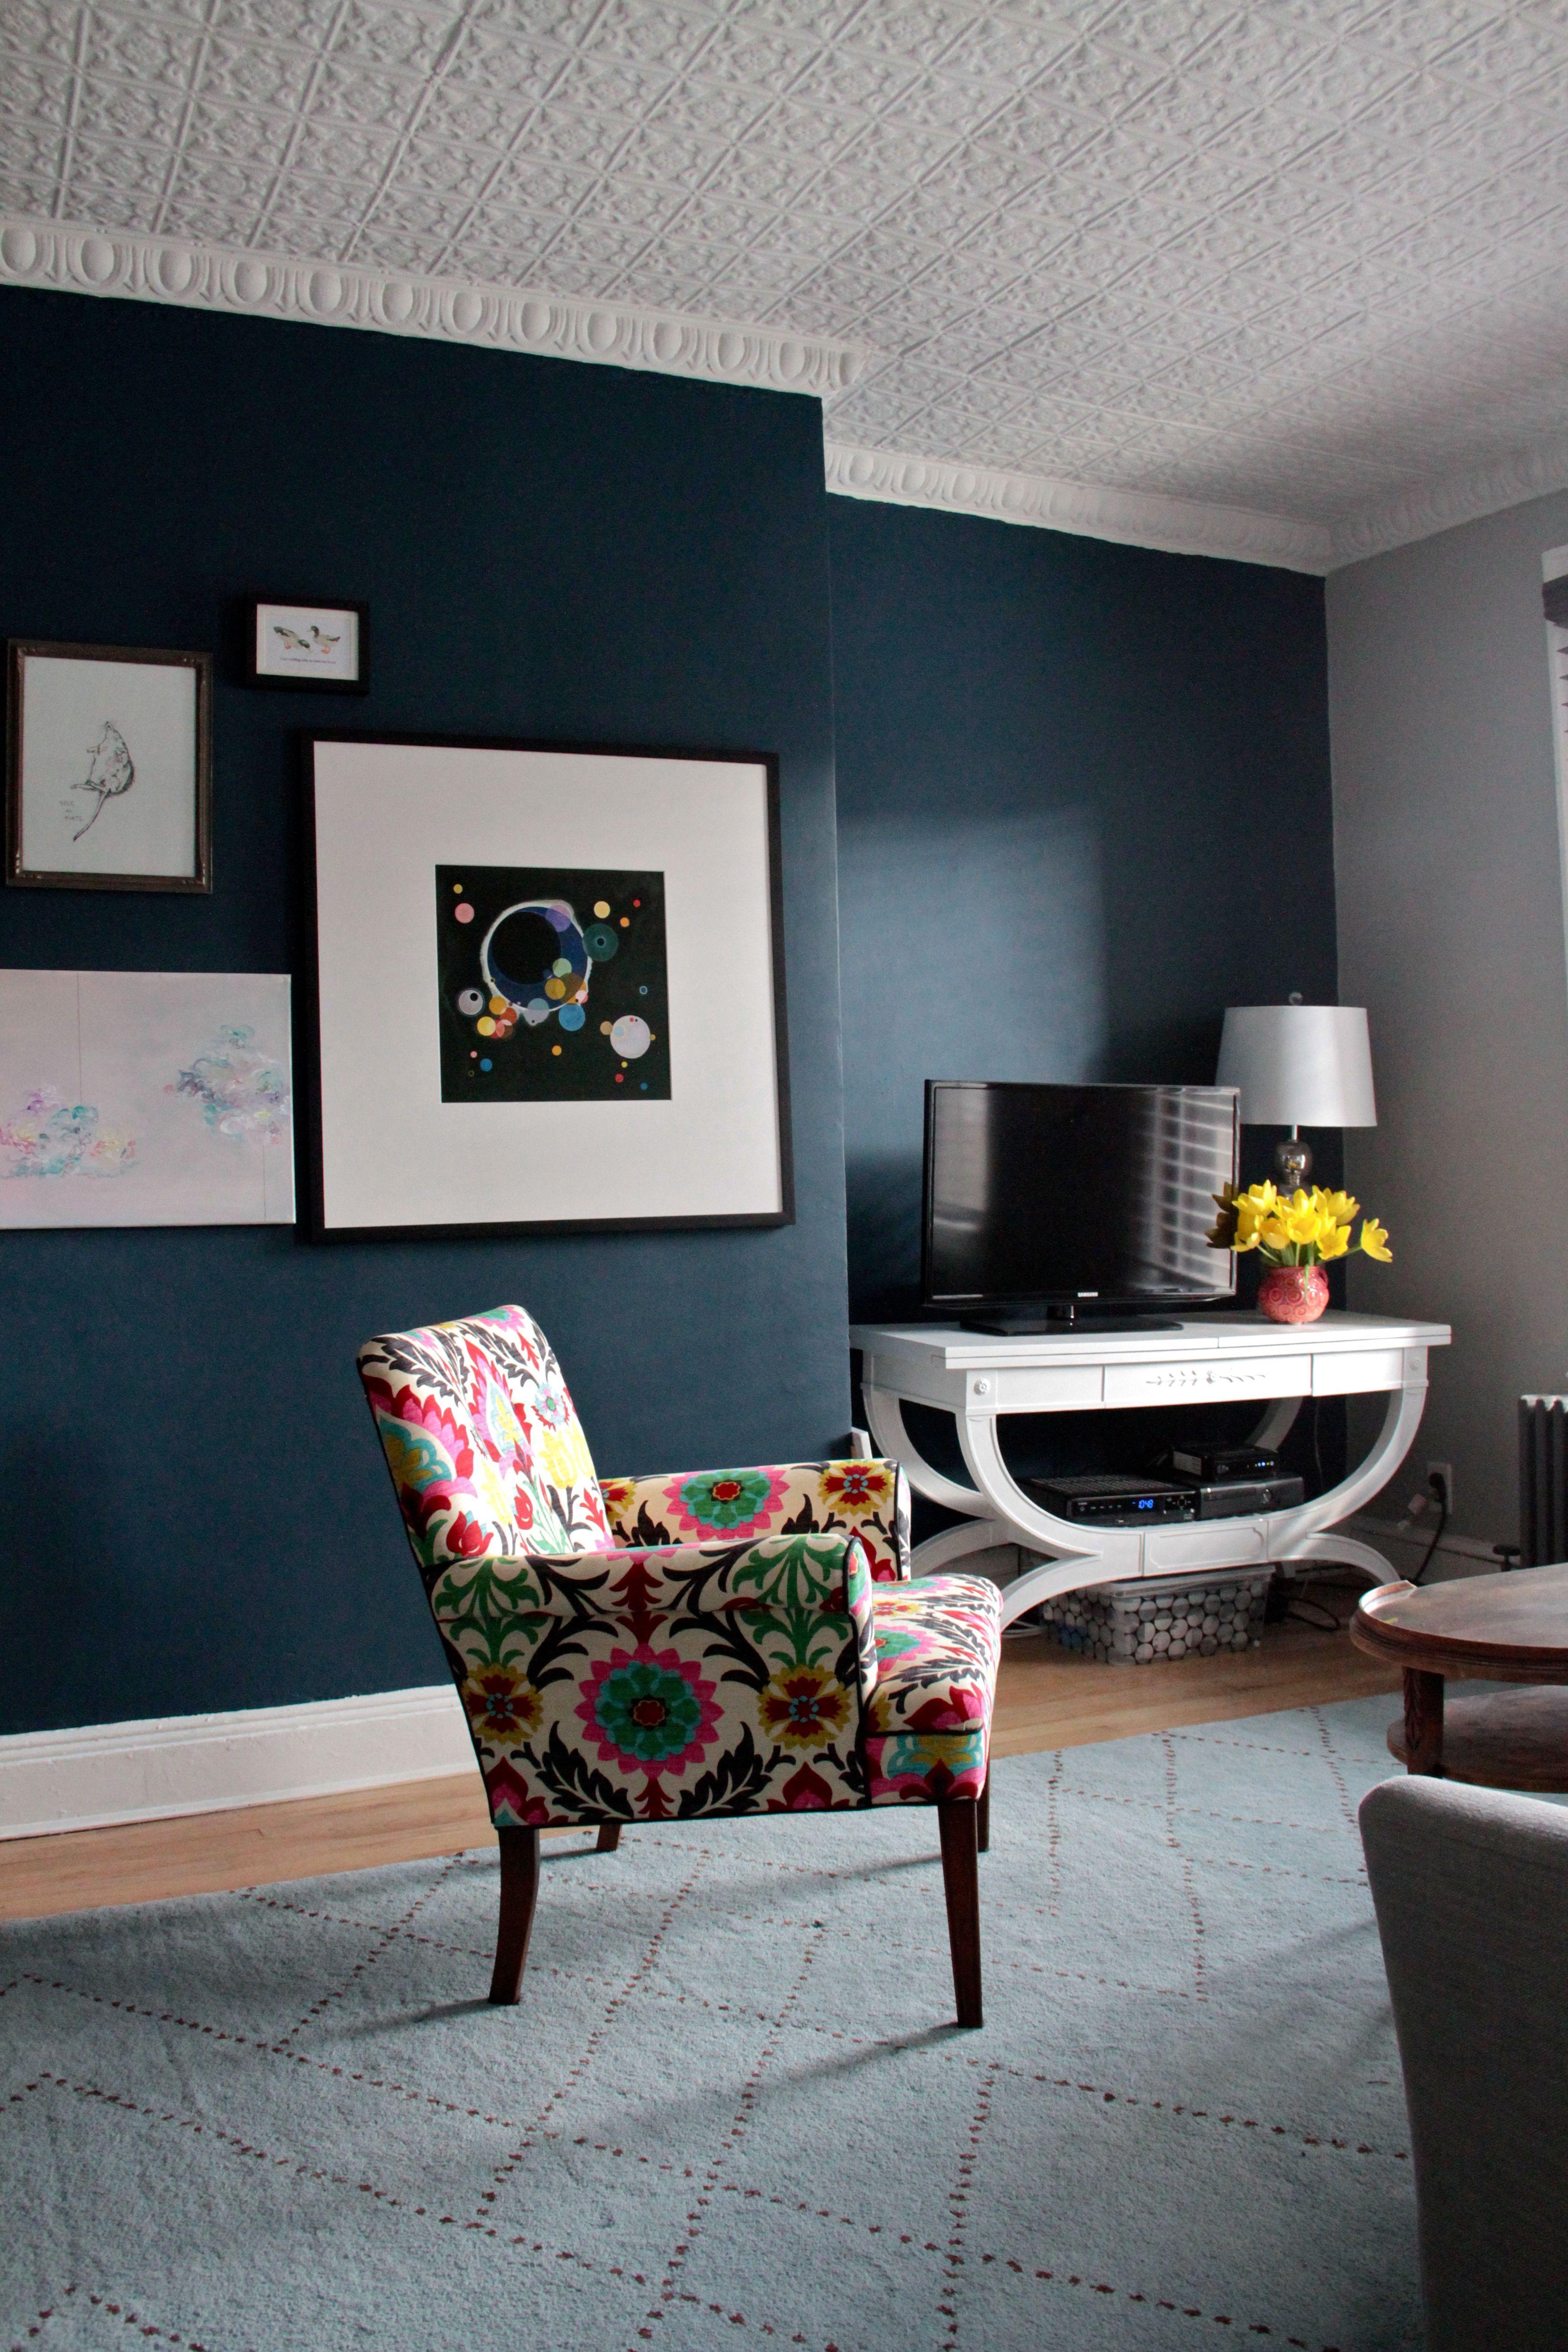 Symphony blue 2060 10 paint benjamin moore symphony blue paint color - Gentleman S Gray 2062 20 By Benjamin Moore In Aura Flat Matte